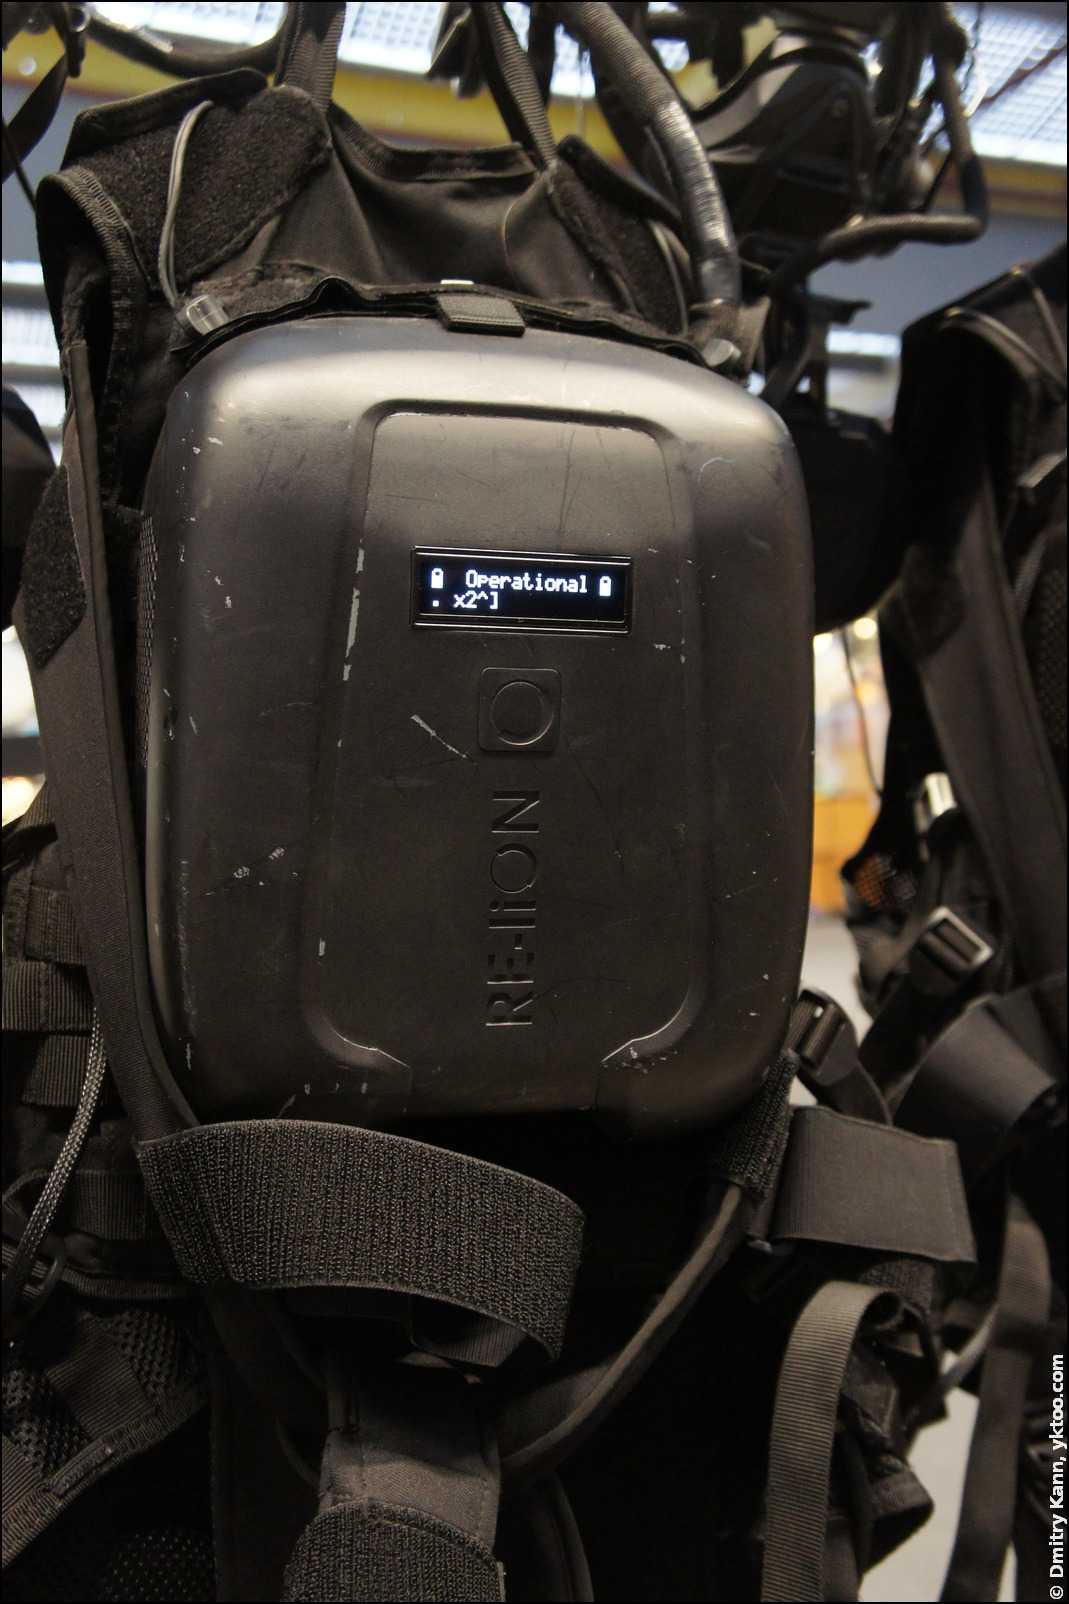 Тактический рюкзак SUIT (Small Unit Immersive Trainer).